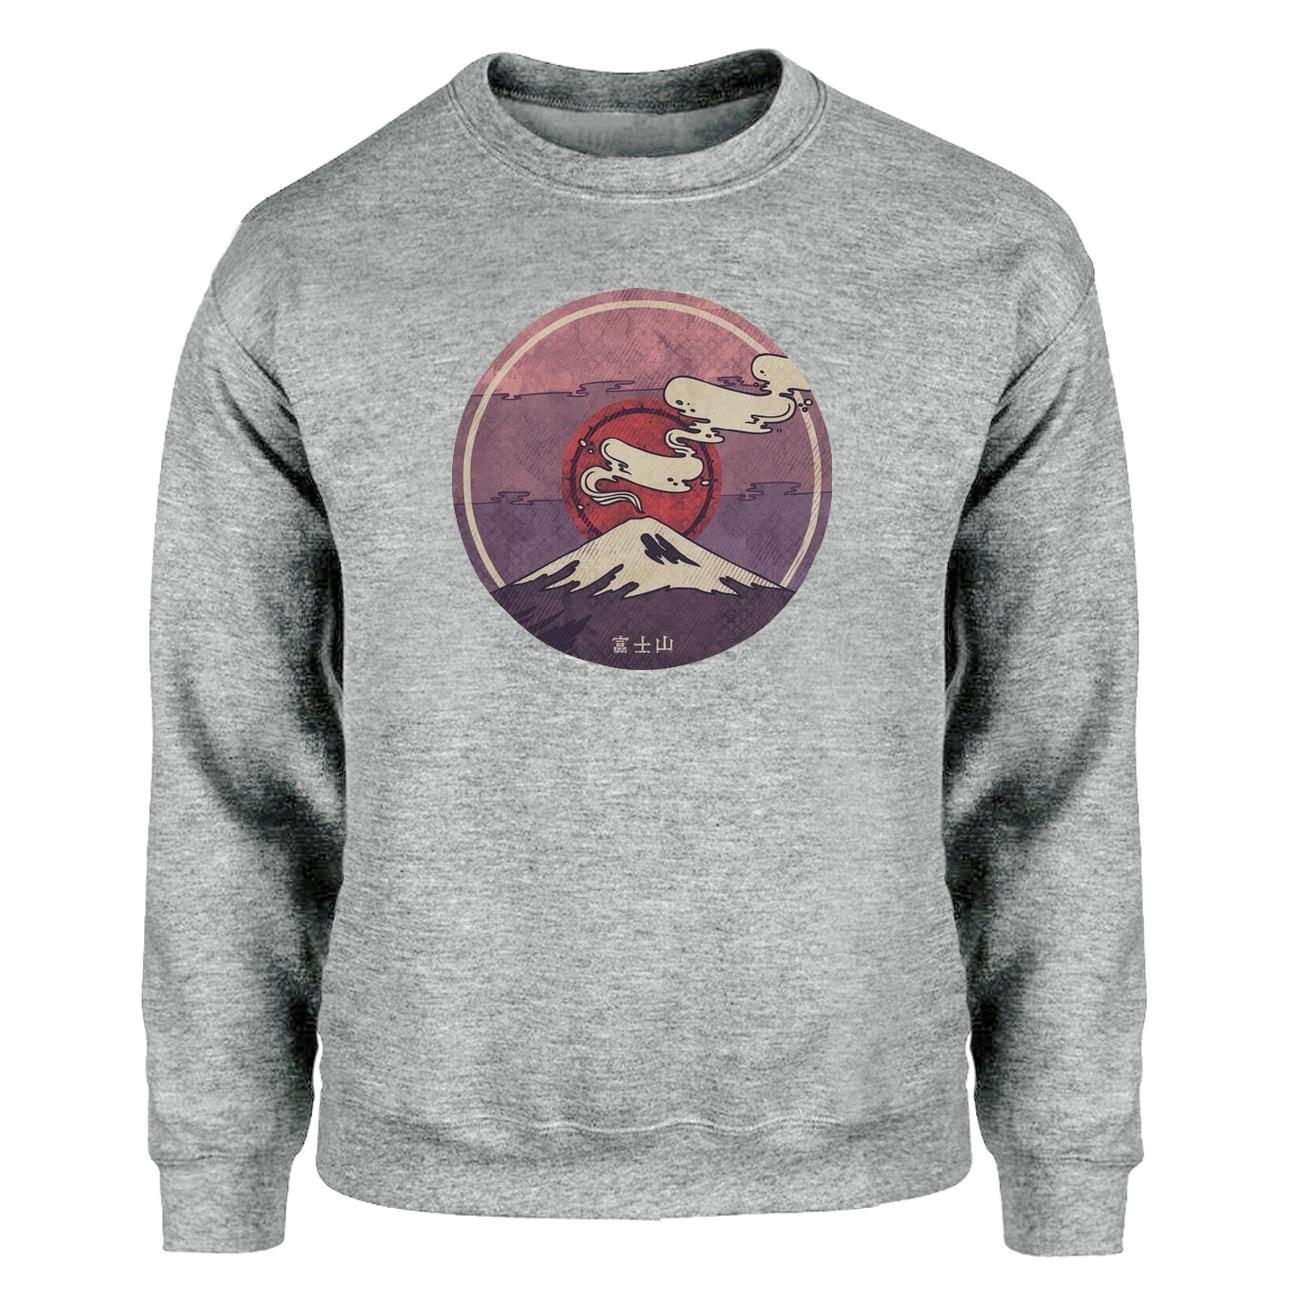 Mount Fuji Hoodies Sweatshirt Men Japan Crewneck Sweatshirts Hipster Winter Autumn Fleece Warm Streetwear Print Loose Sportswear